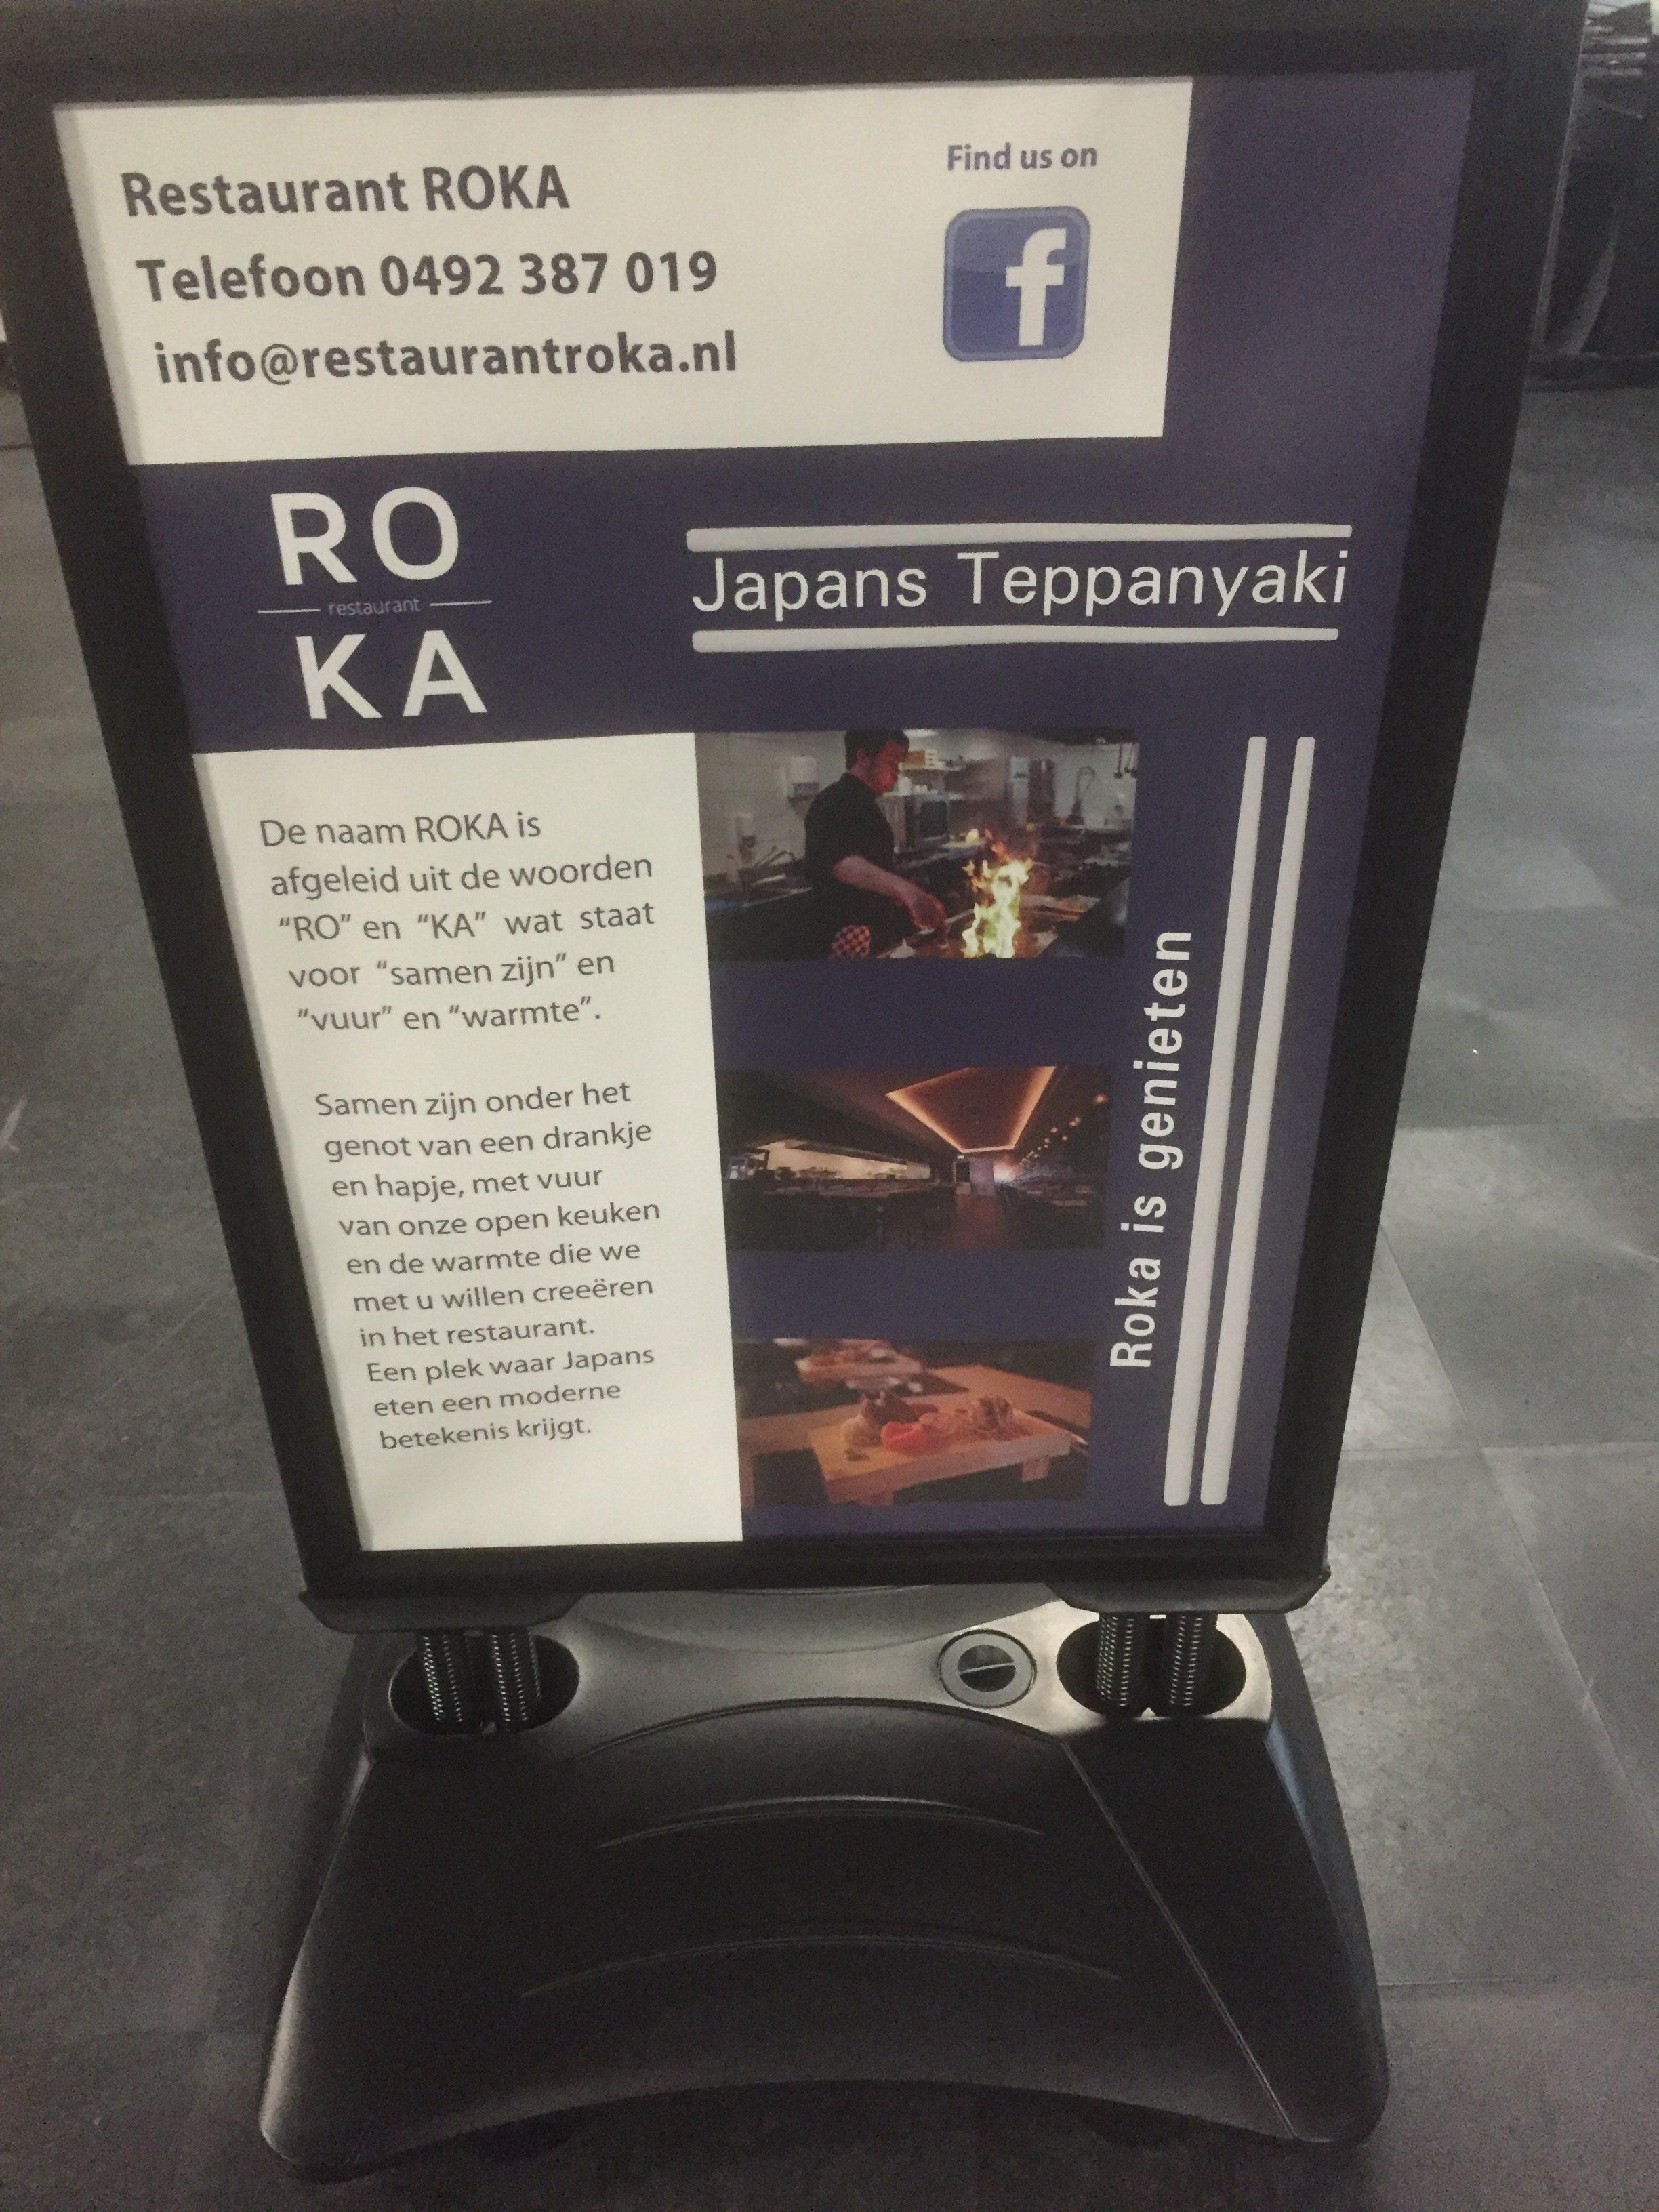 Restaurant Roka